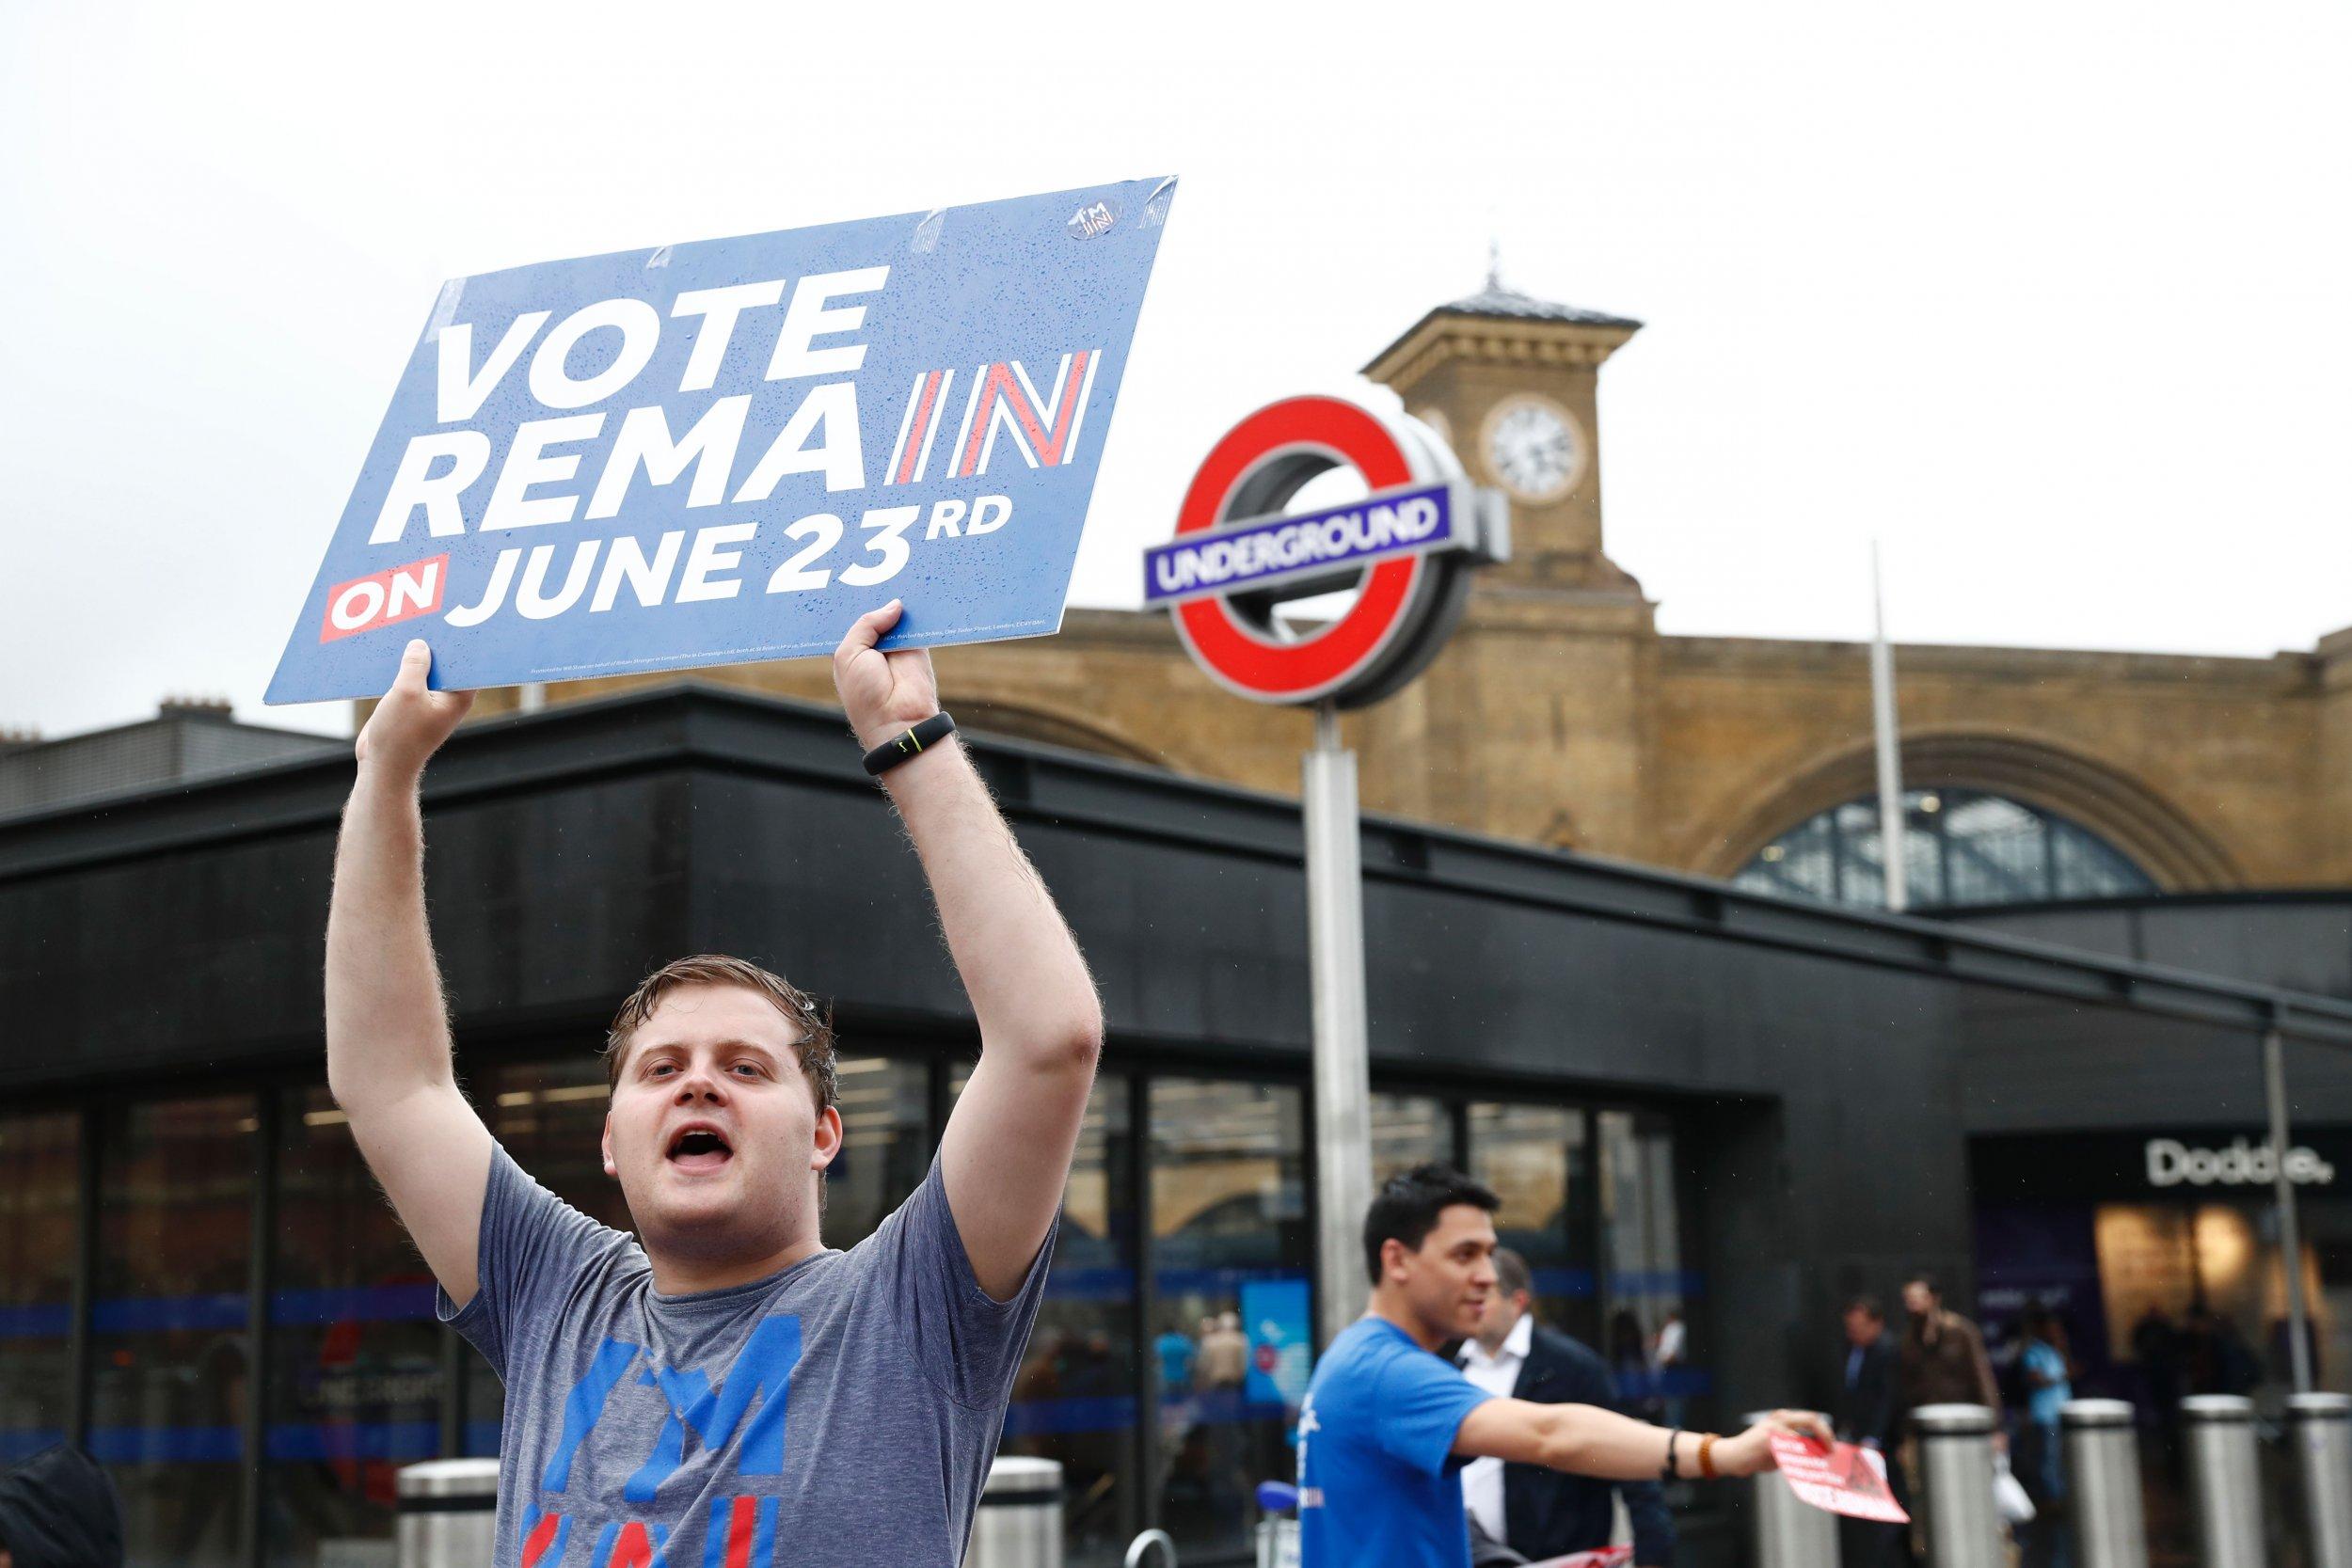 Remain voter in British referendum